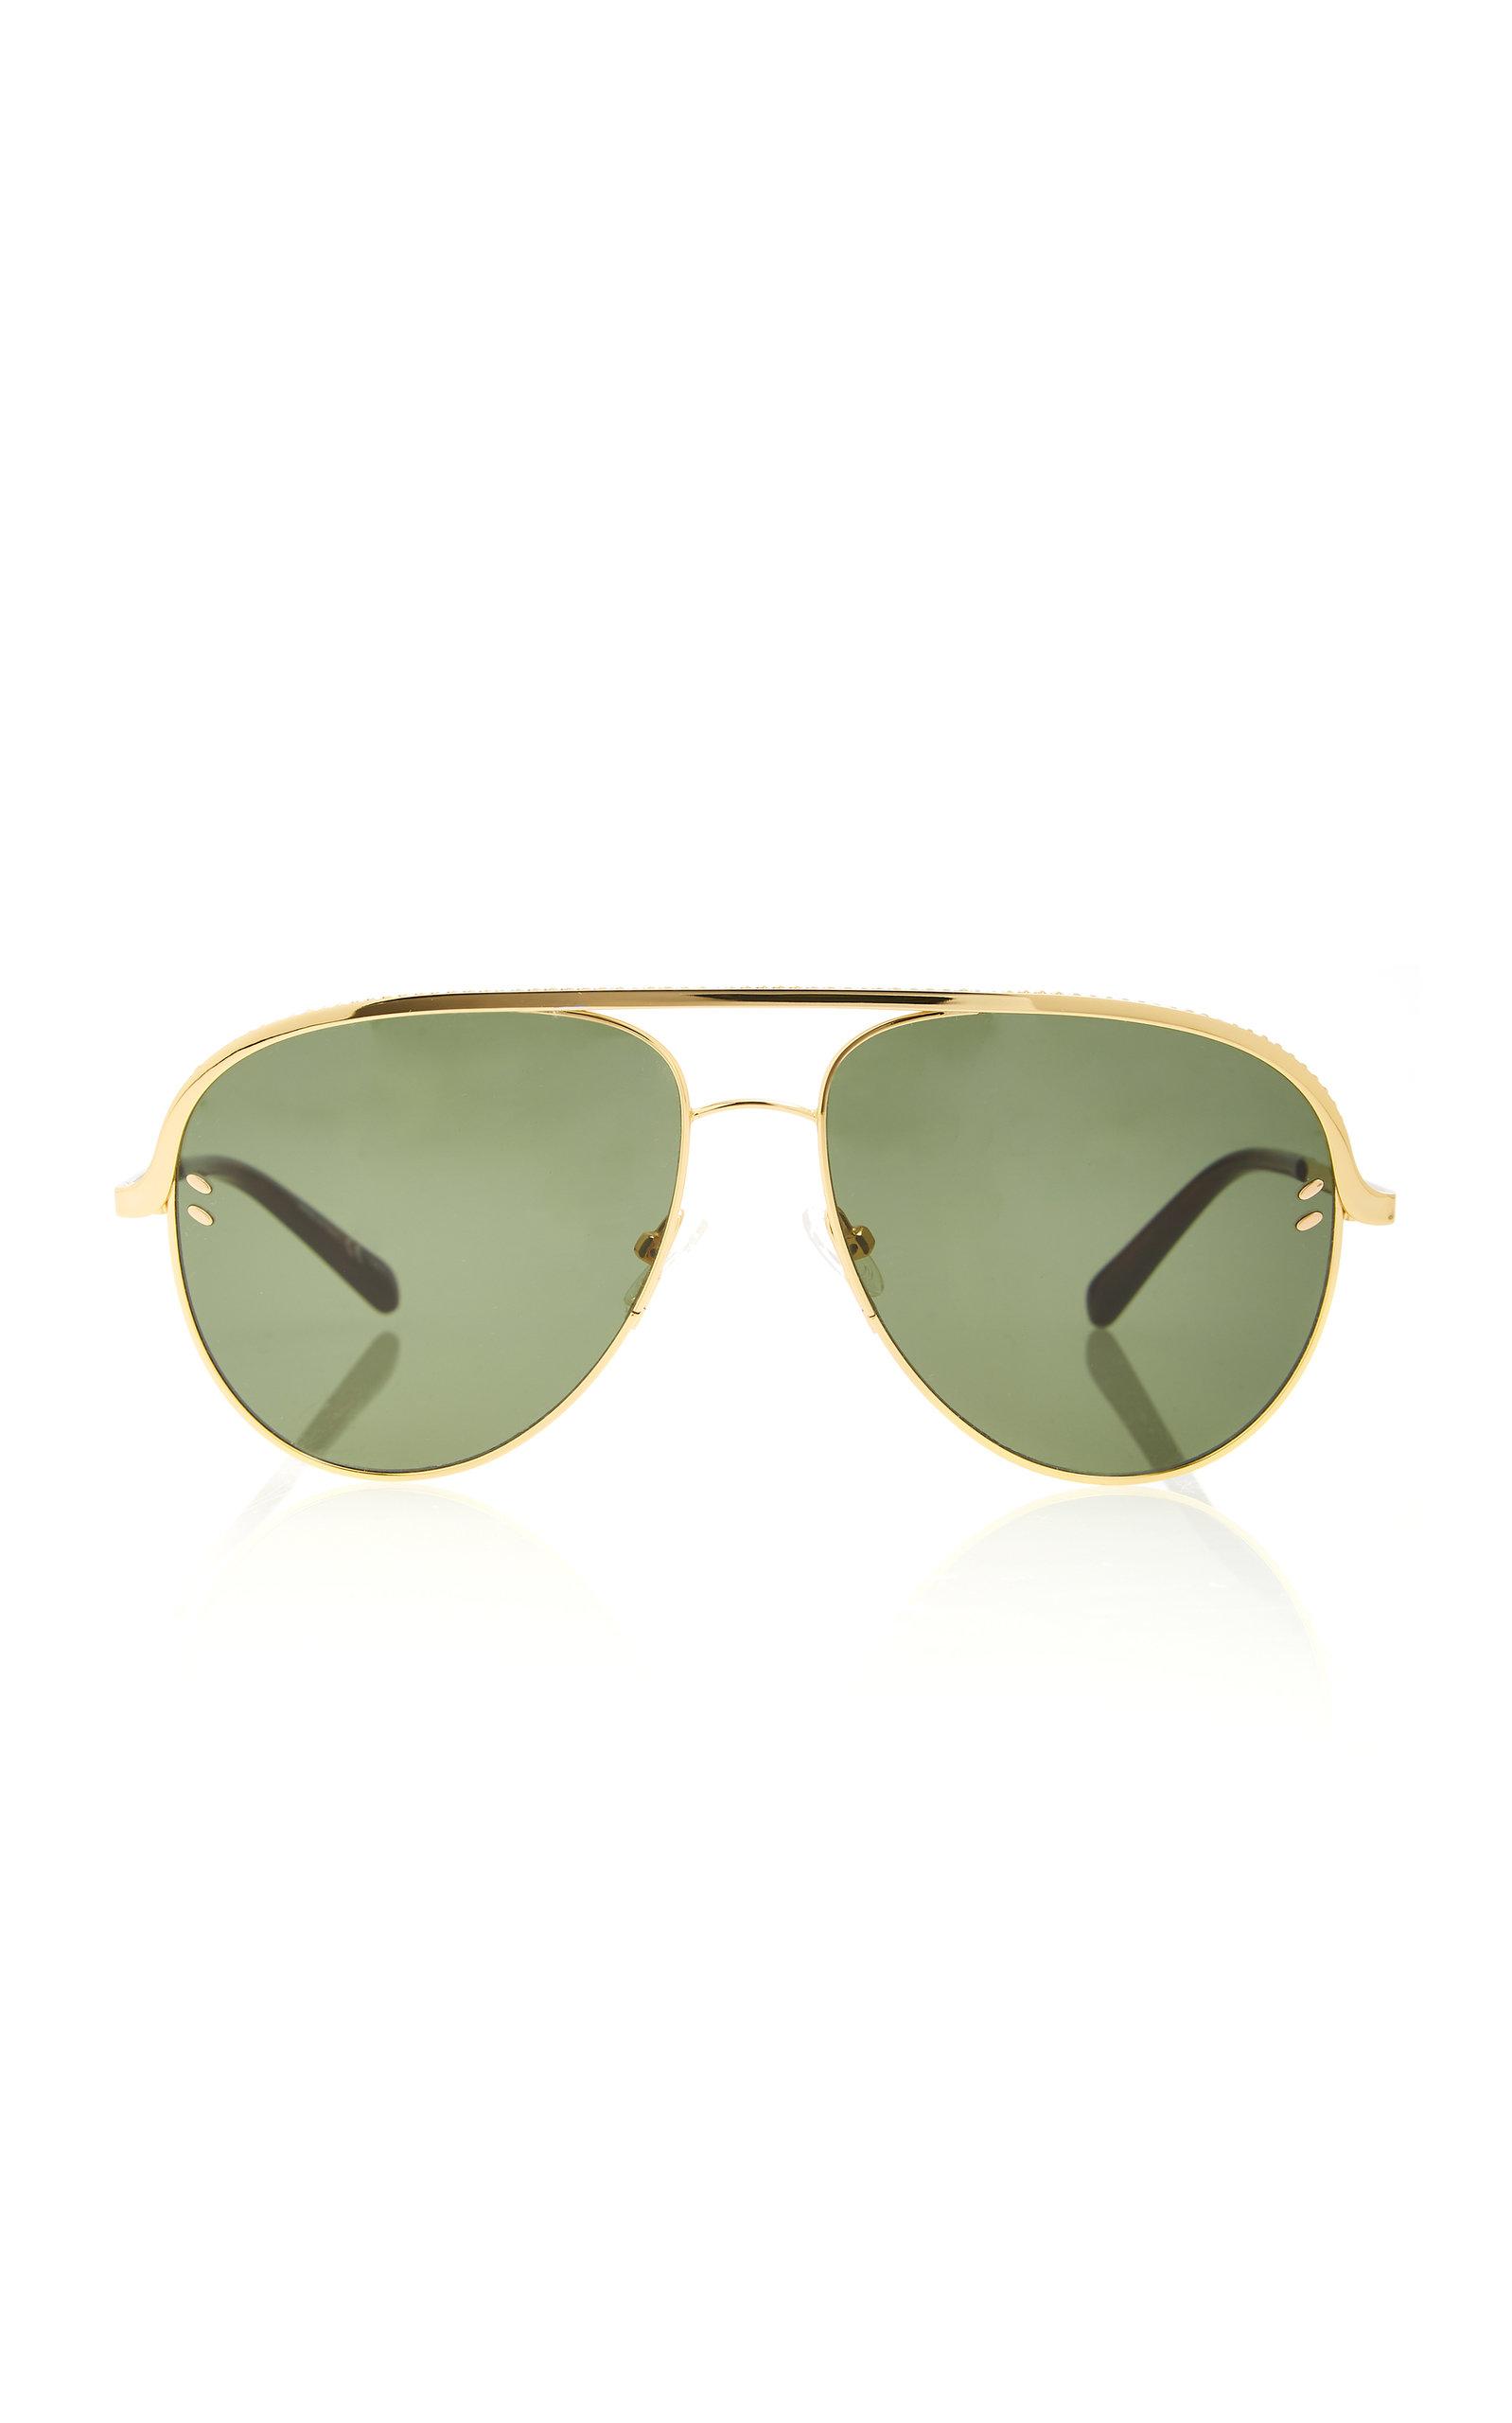 46c46c83b20b Stella McCartney SunglassesFalabella Gold-Tone Aviator Sunglasses. CLOSE.  Loading